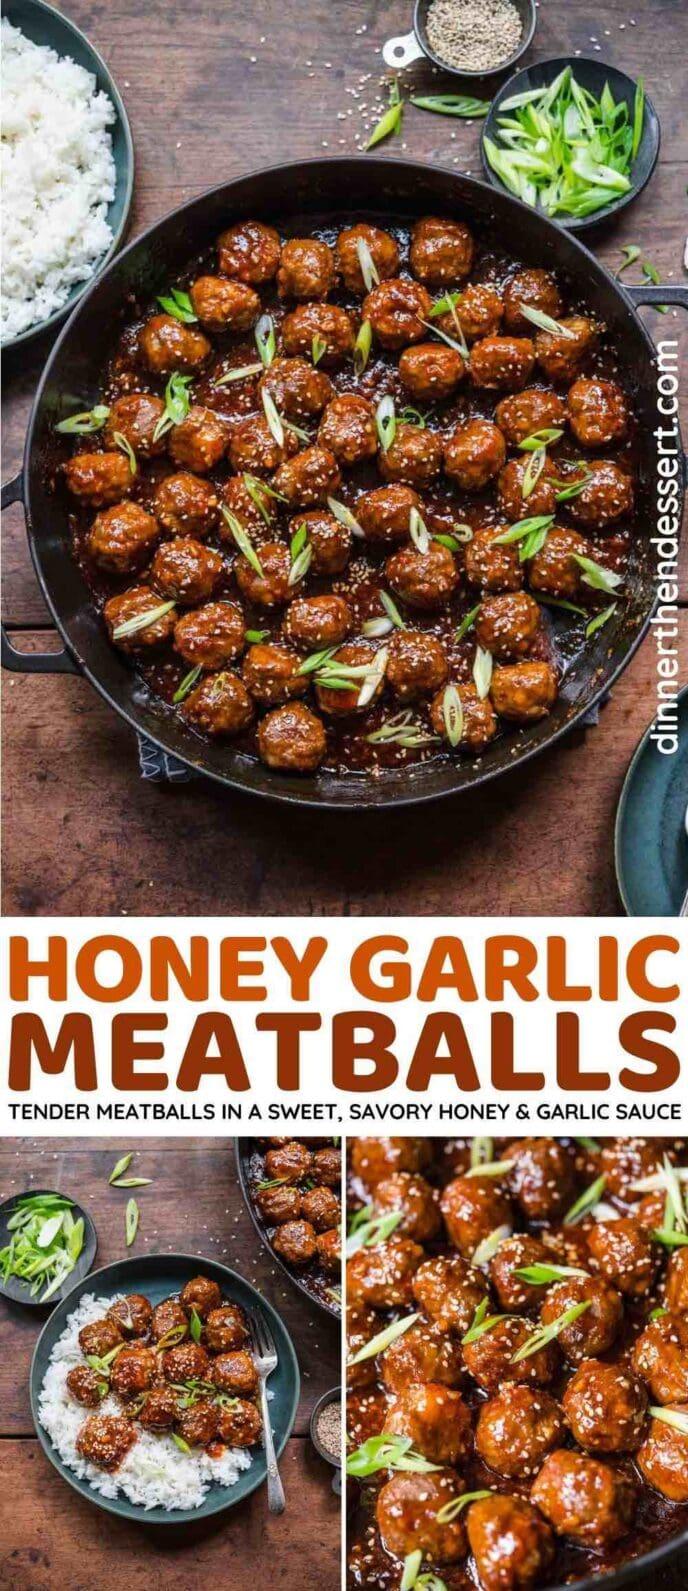 Honey Garlic Meatballs collage